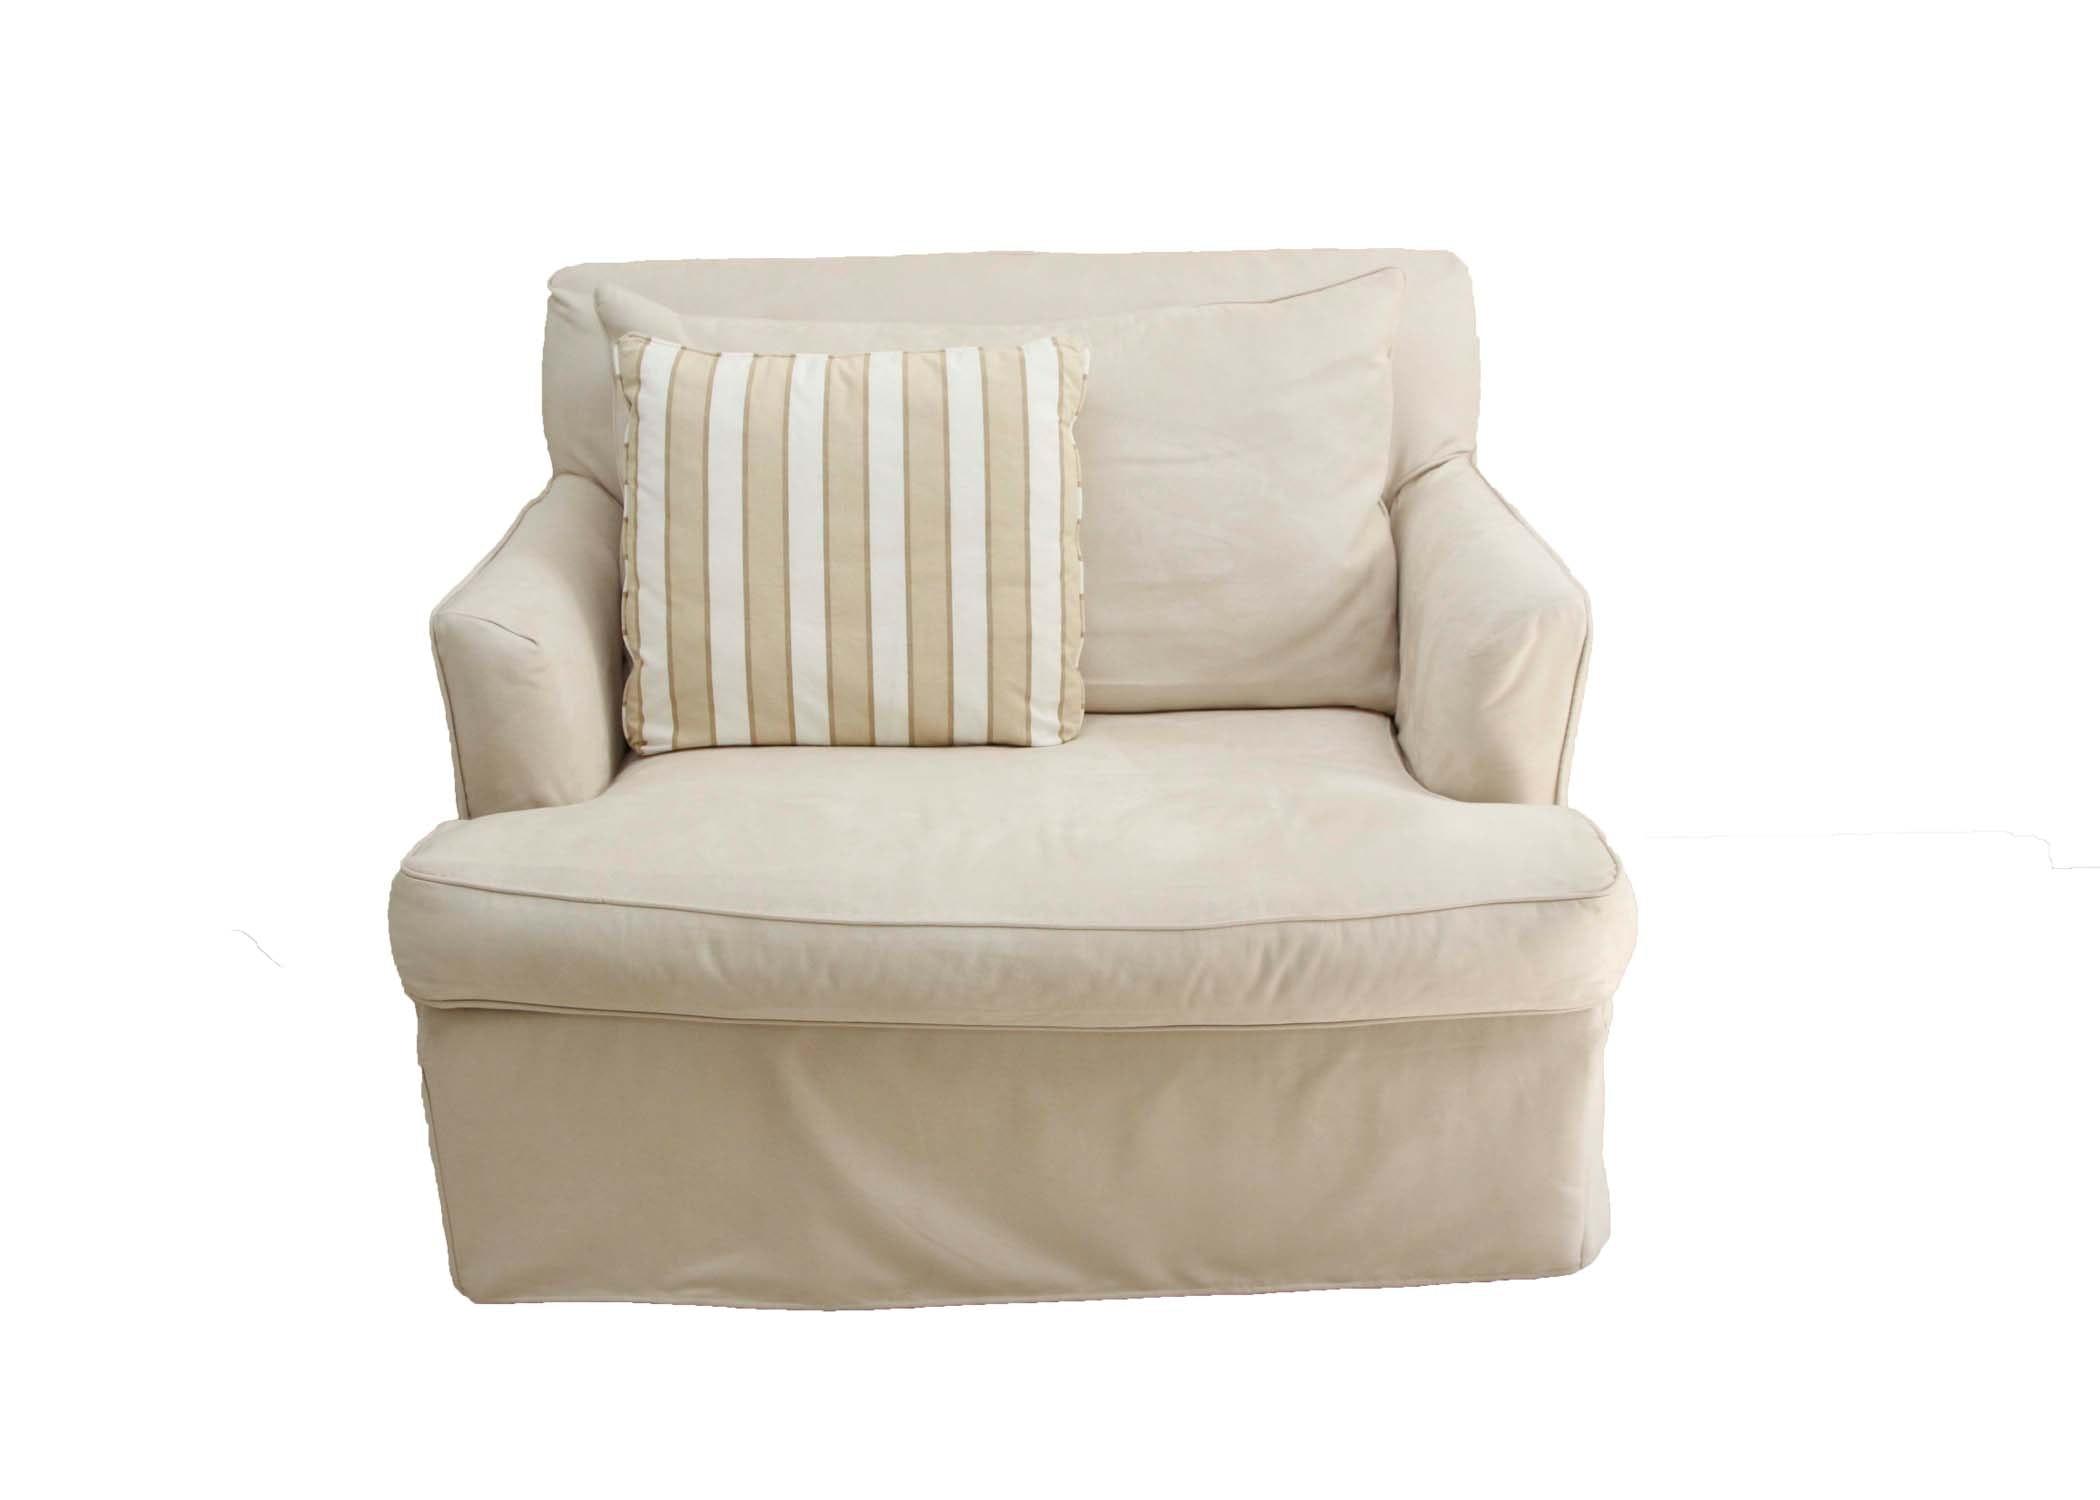 Ethan Allen Oversized Chair